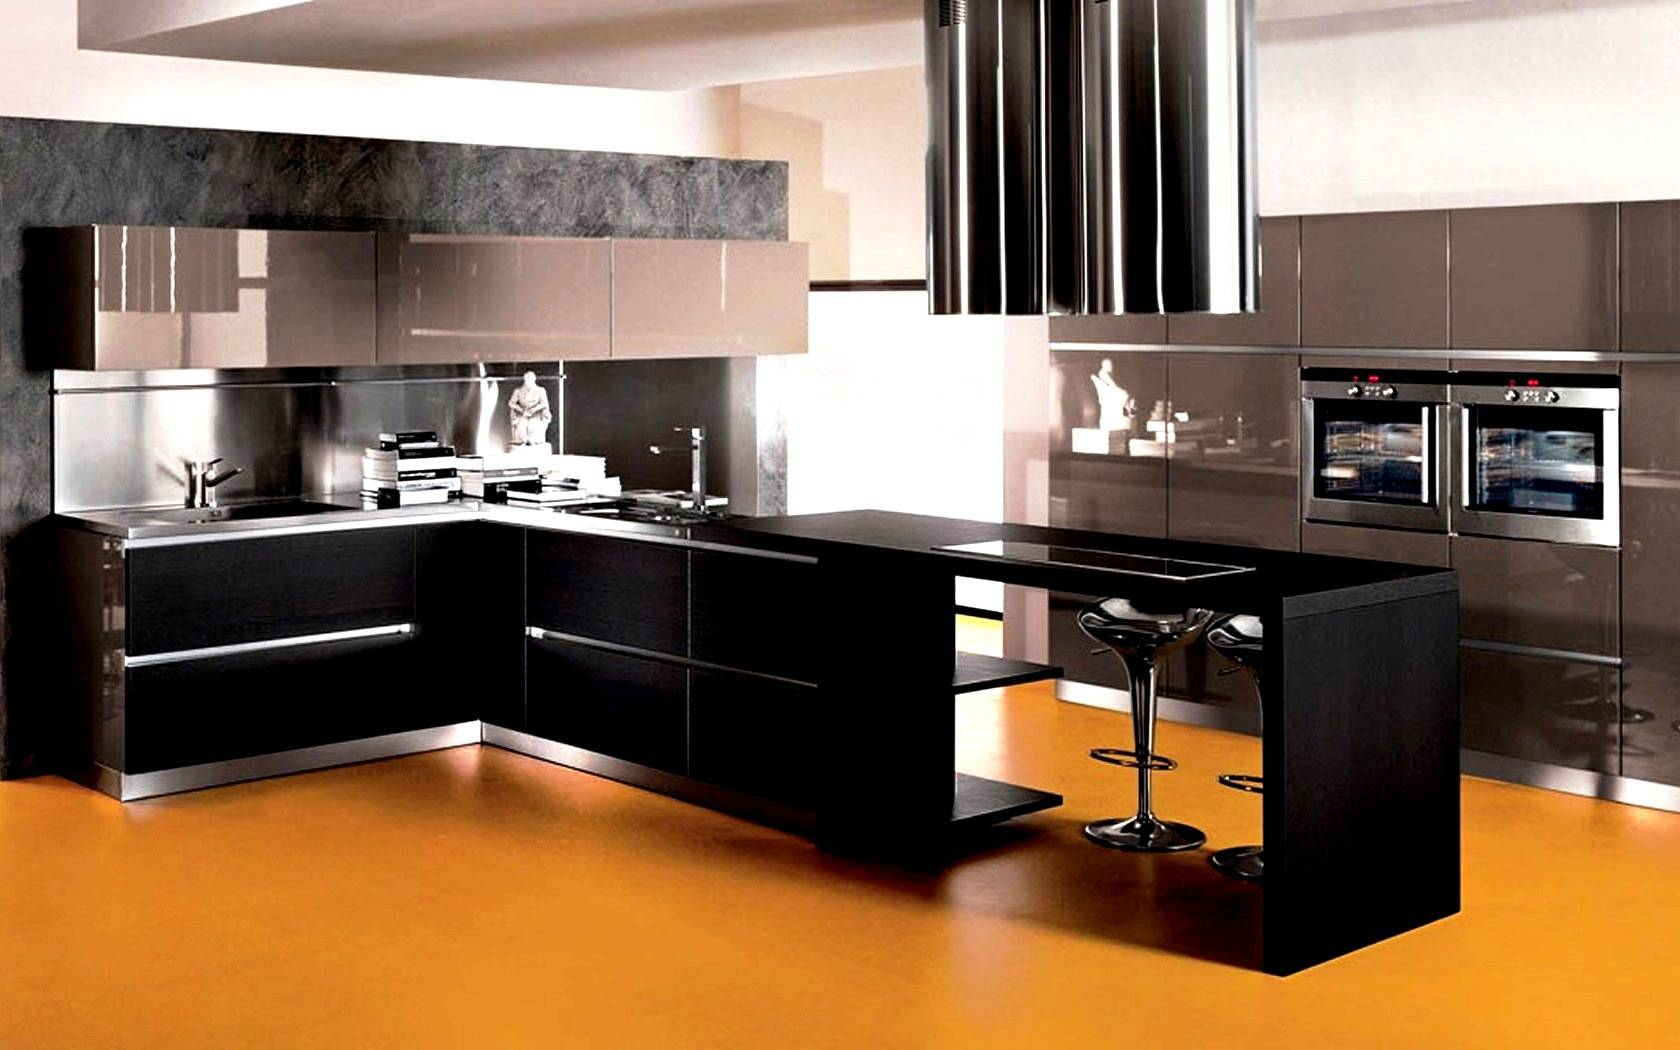 U Shaped Modular Kitchen Design Images